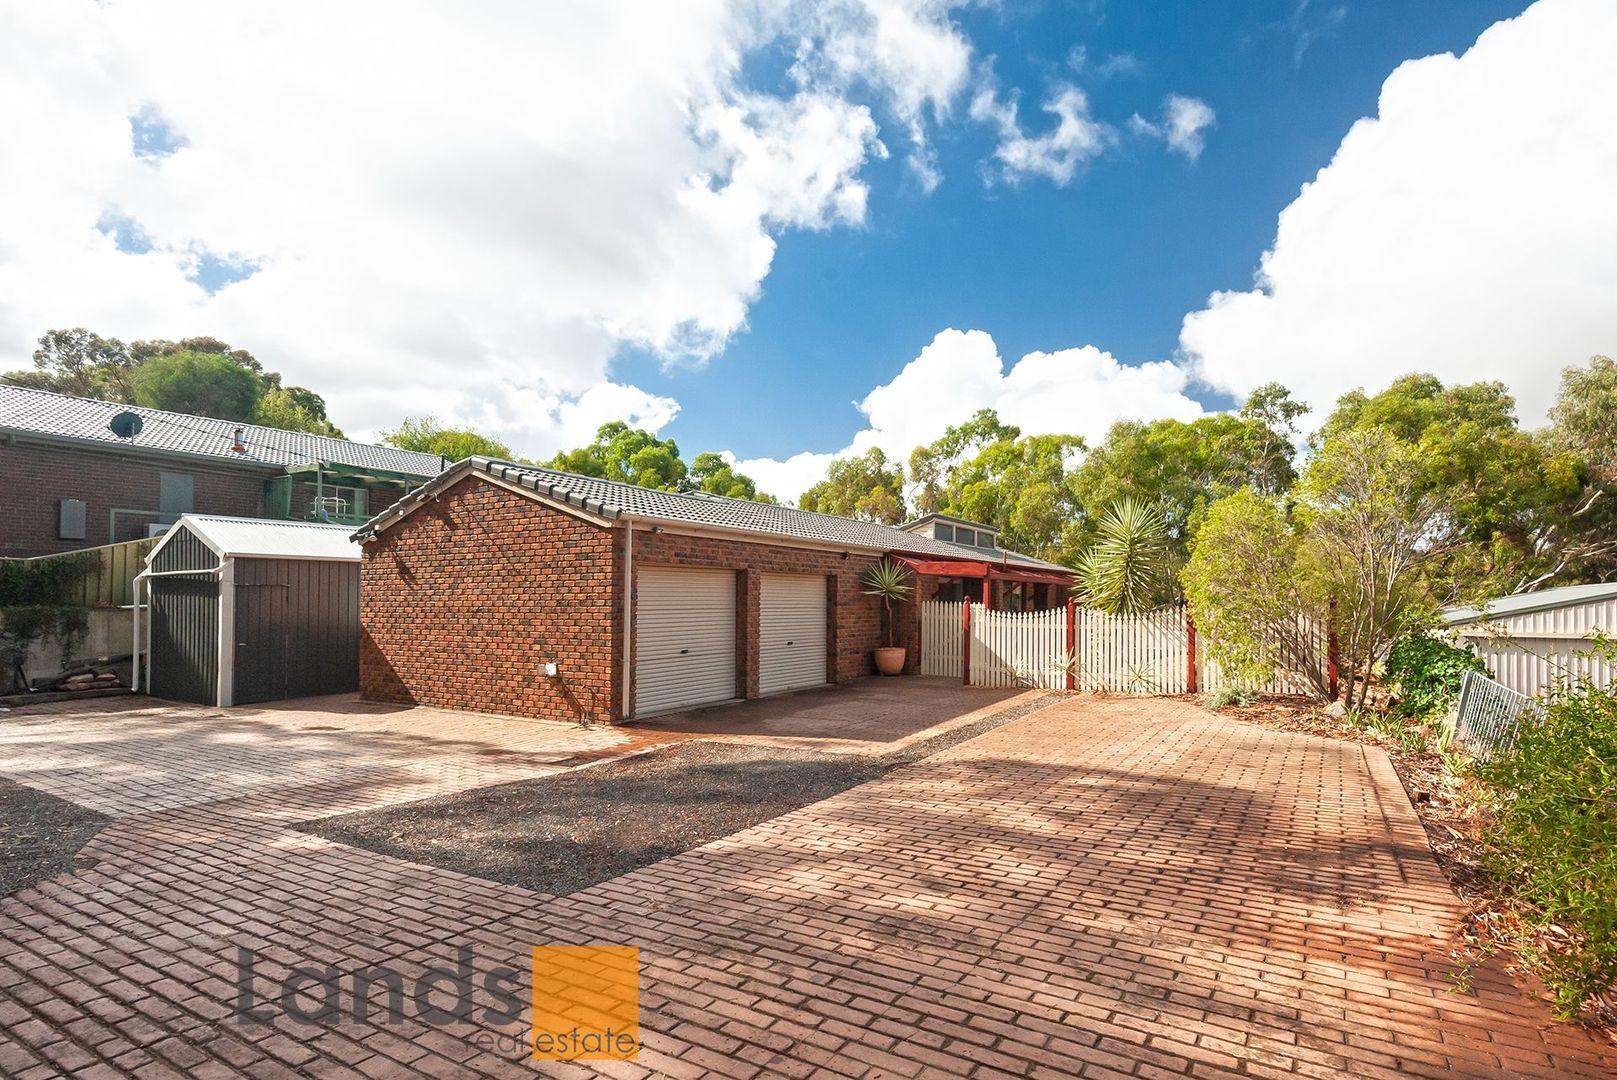 101 Seaview Road, Yatala Vale SA 5126, Image 0